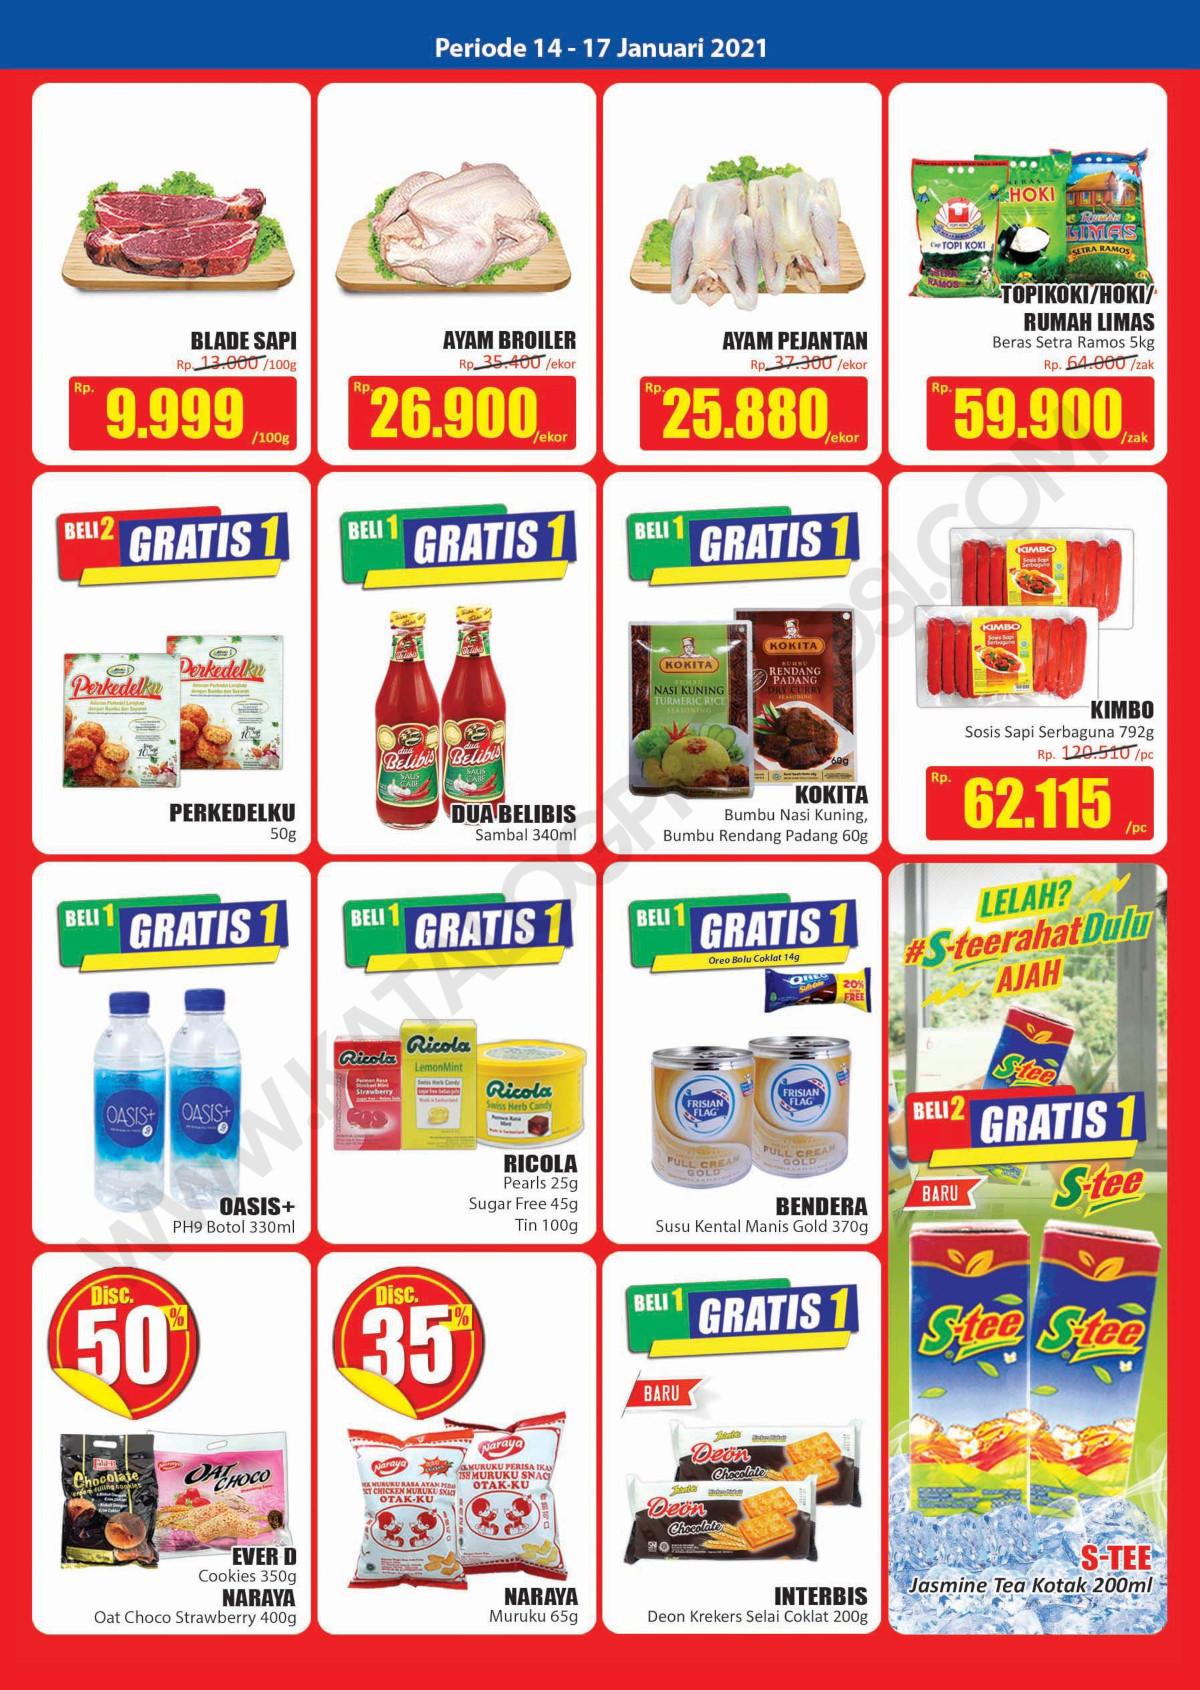 Katalog Promo Hari Hari Pasar Swalayan Weekend Periode 14-17 Januari 2021